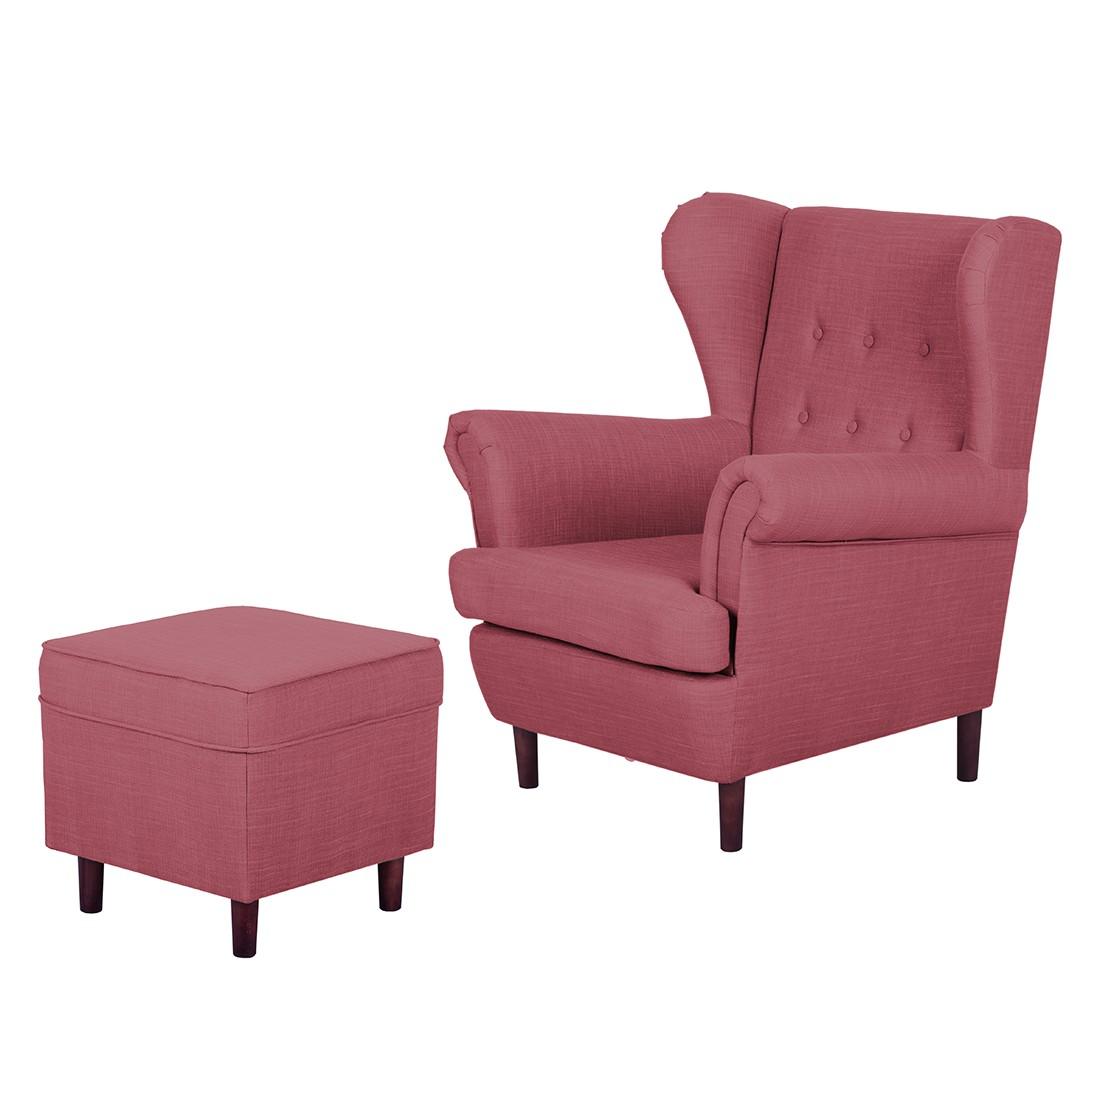 ohrensessel mit hocker ikea ohrensessel mit hocker ikea neuesten ohrensessel mit hocker m bel. Black Bedroom Furniture Sets. Home Design Ideas